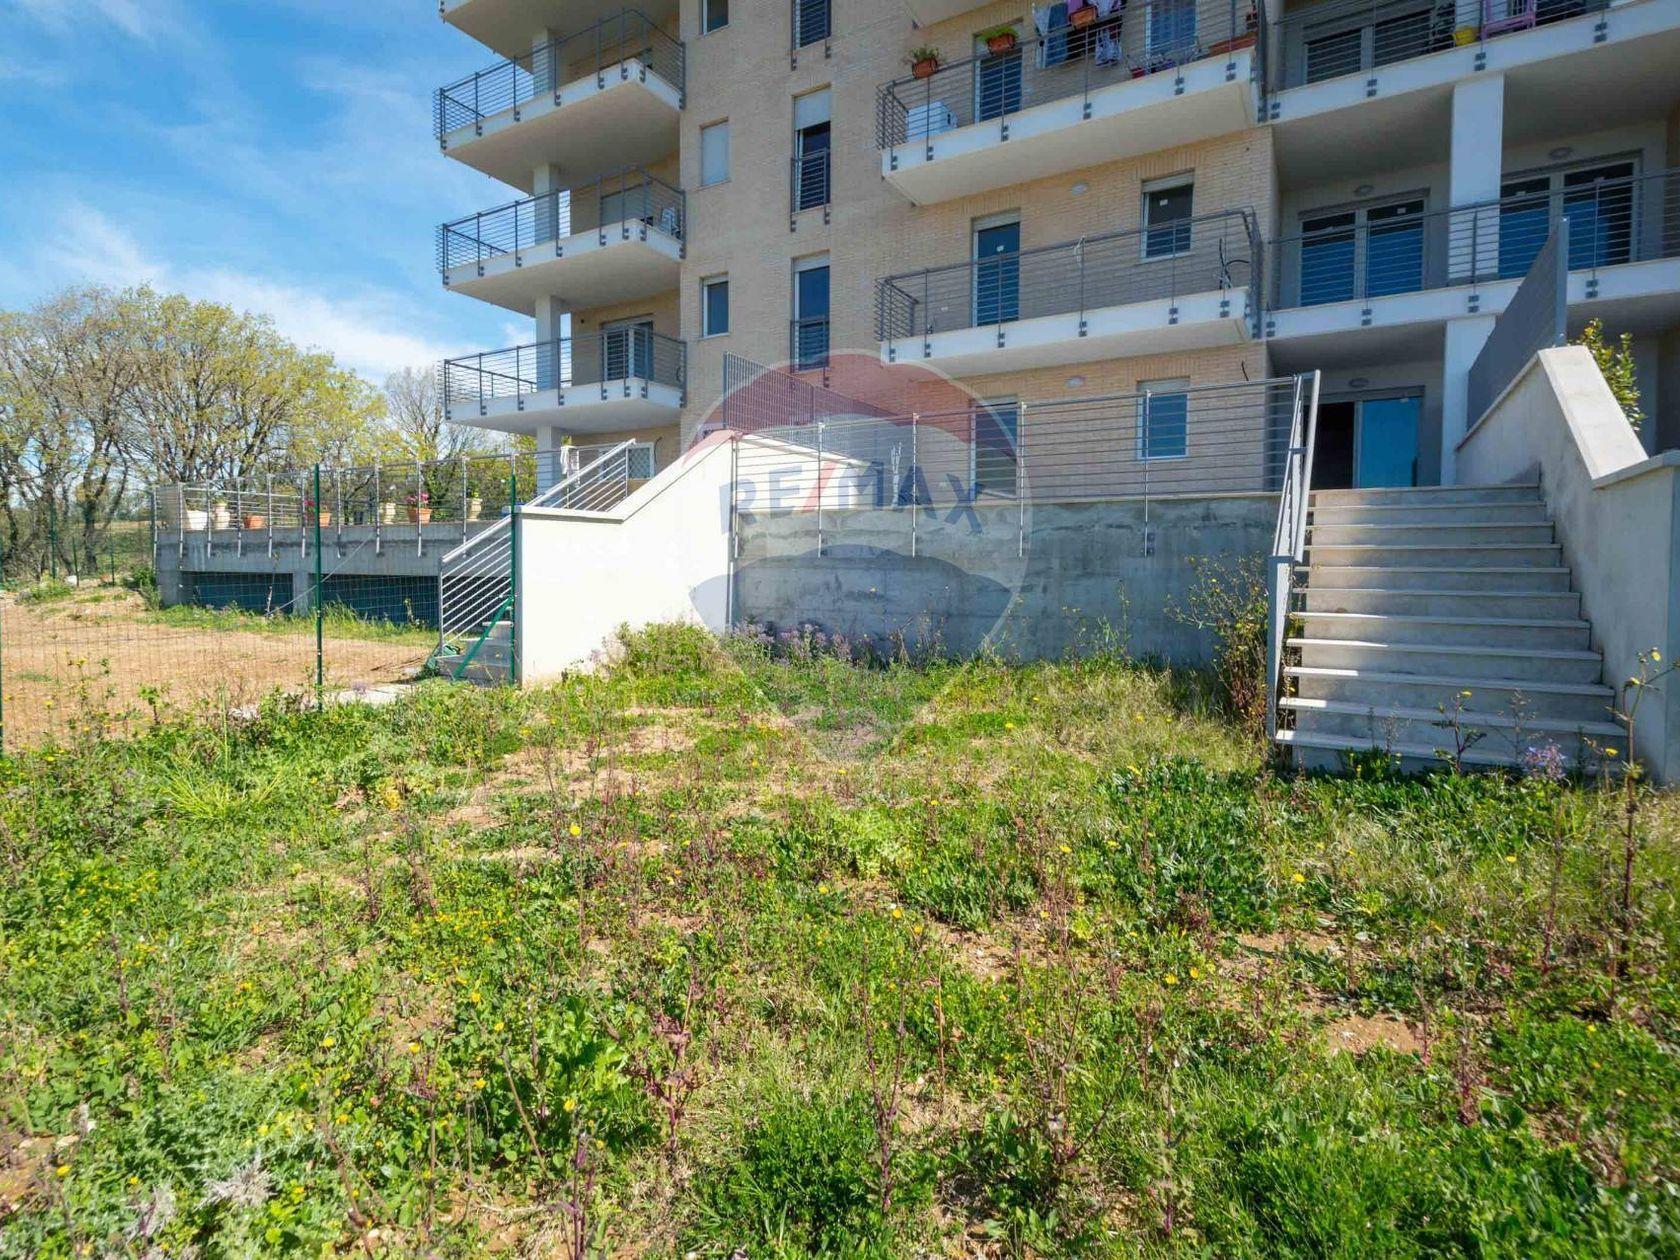 Appartamento Ara Nova, Fiumicino, RM Vendita - Foto 22